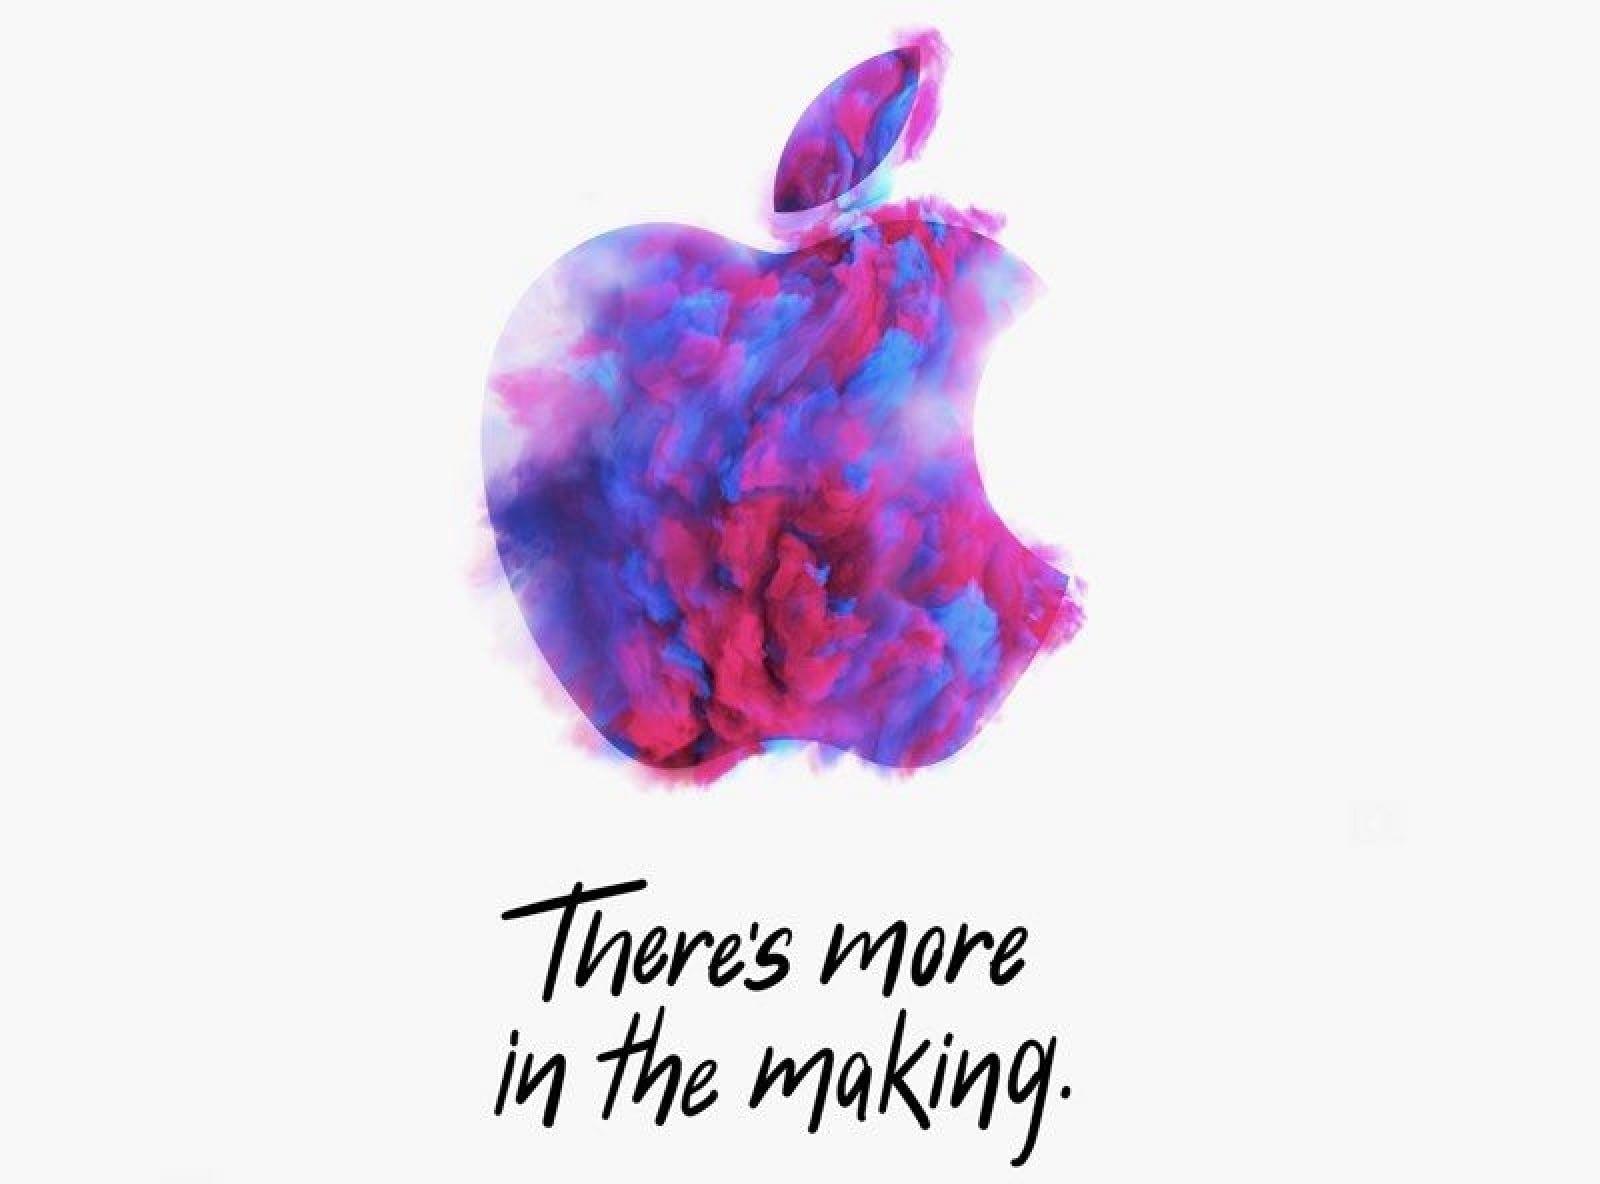 Apple Media Event Invite October 2018